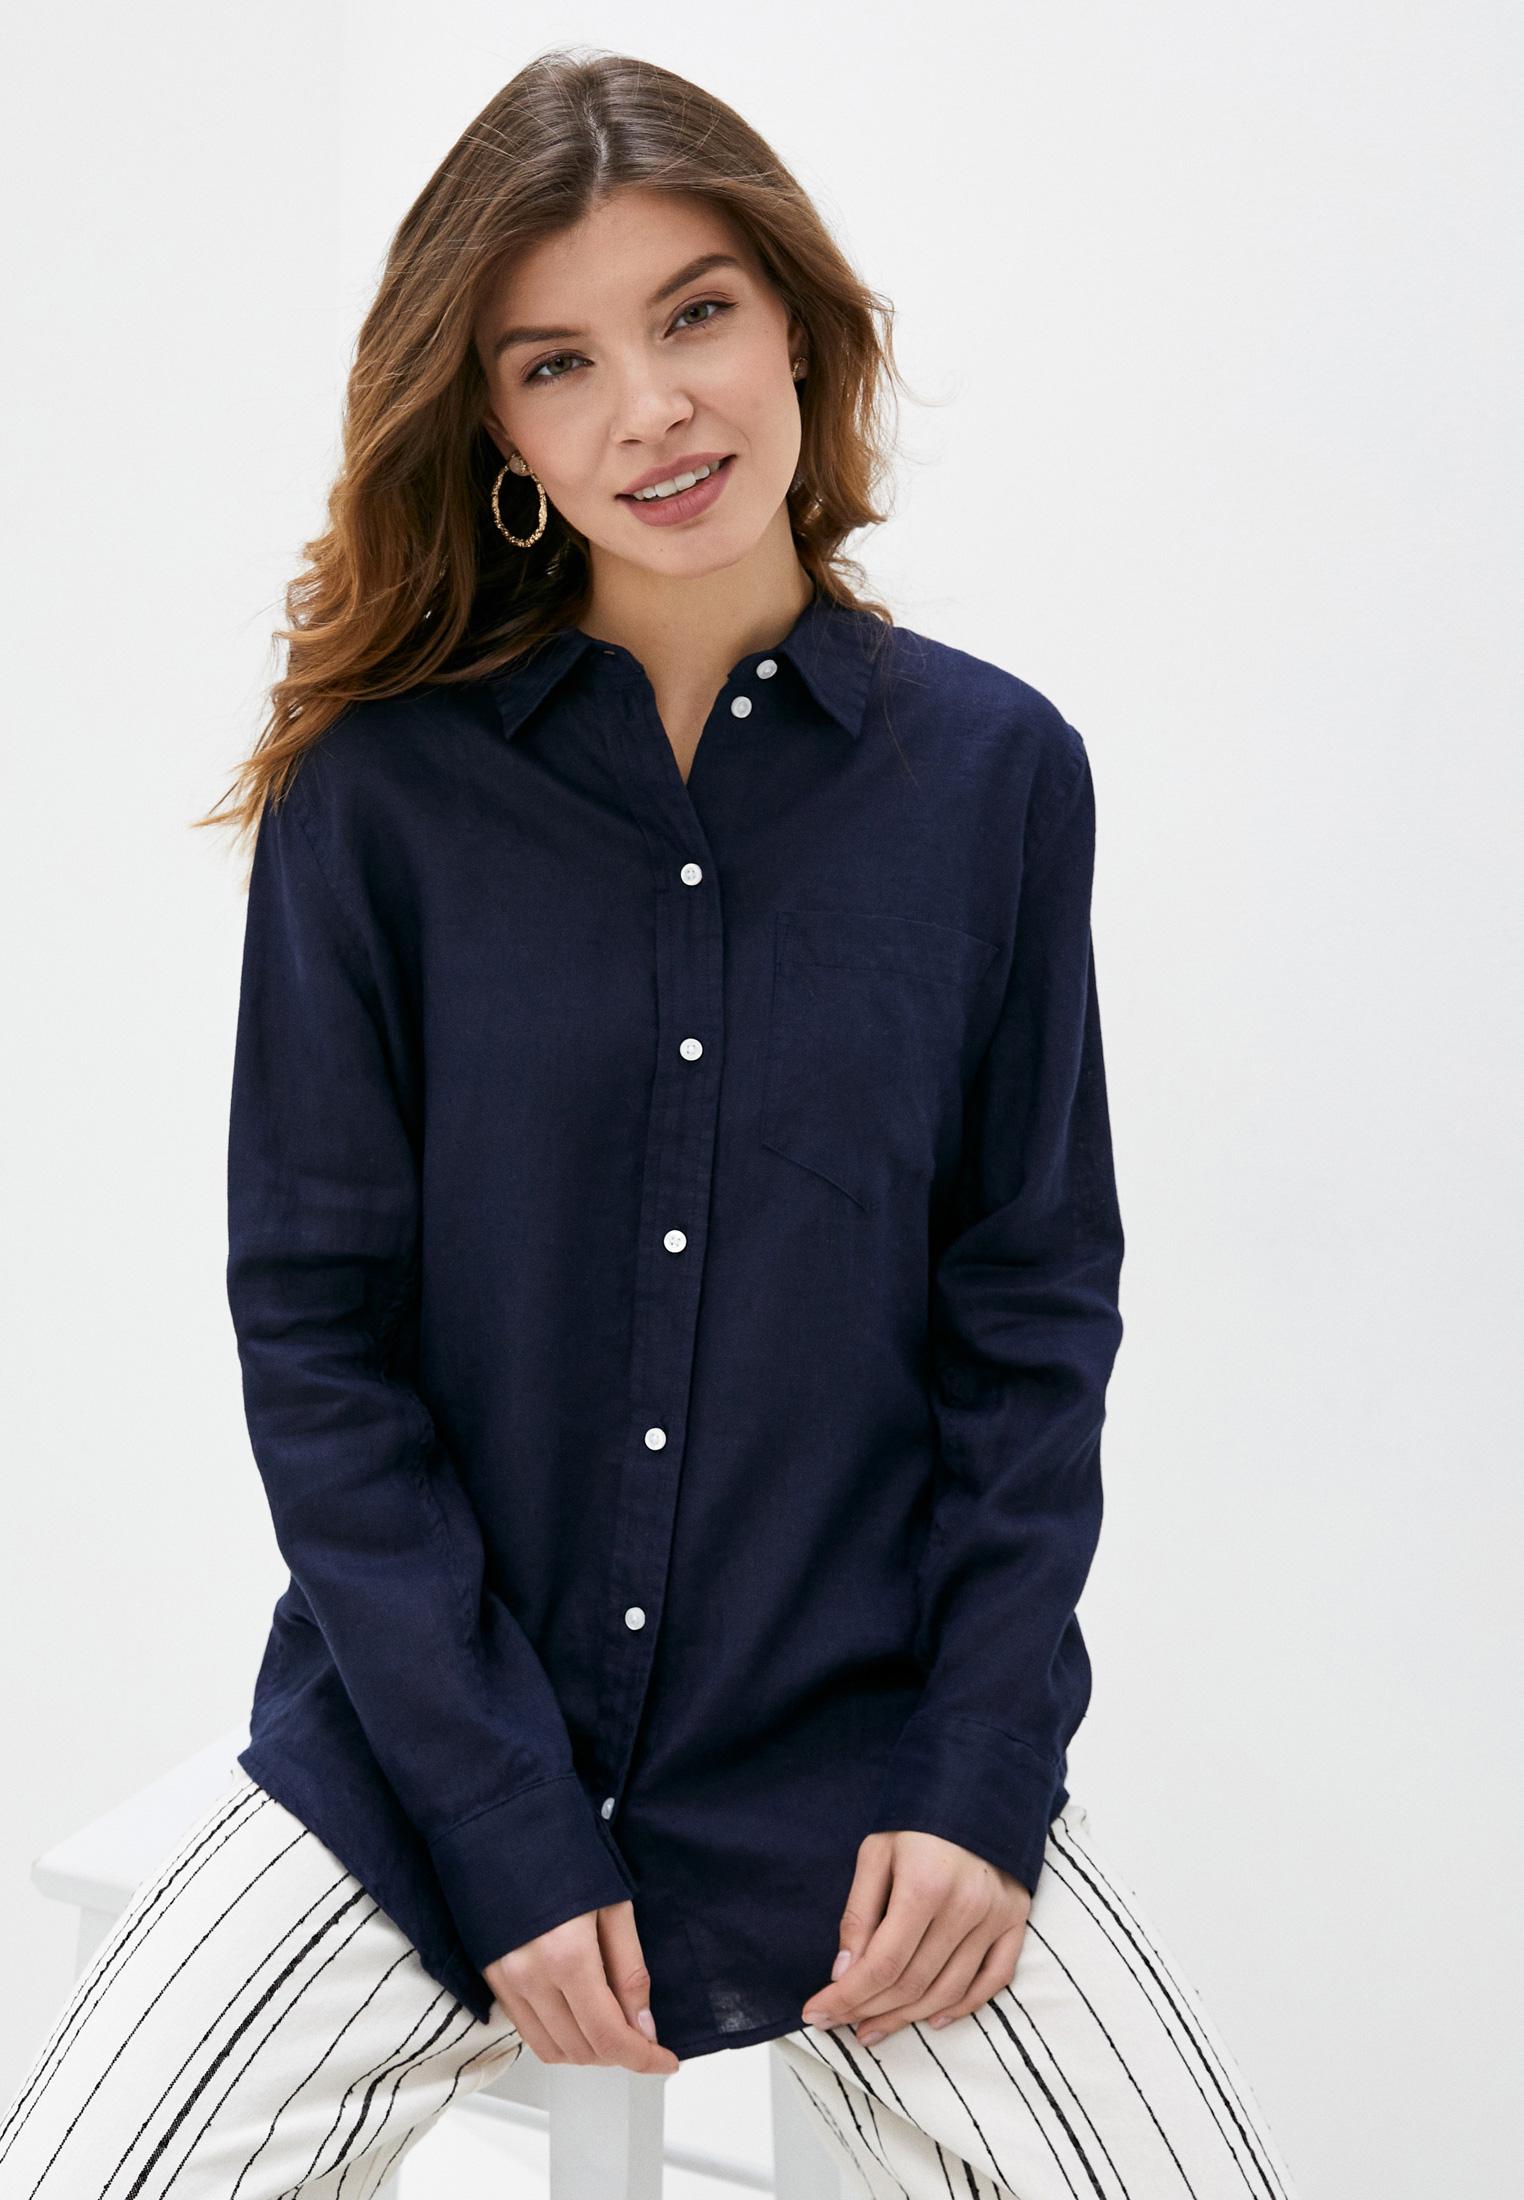 еще картинки рубашек женских самое